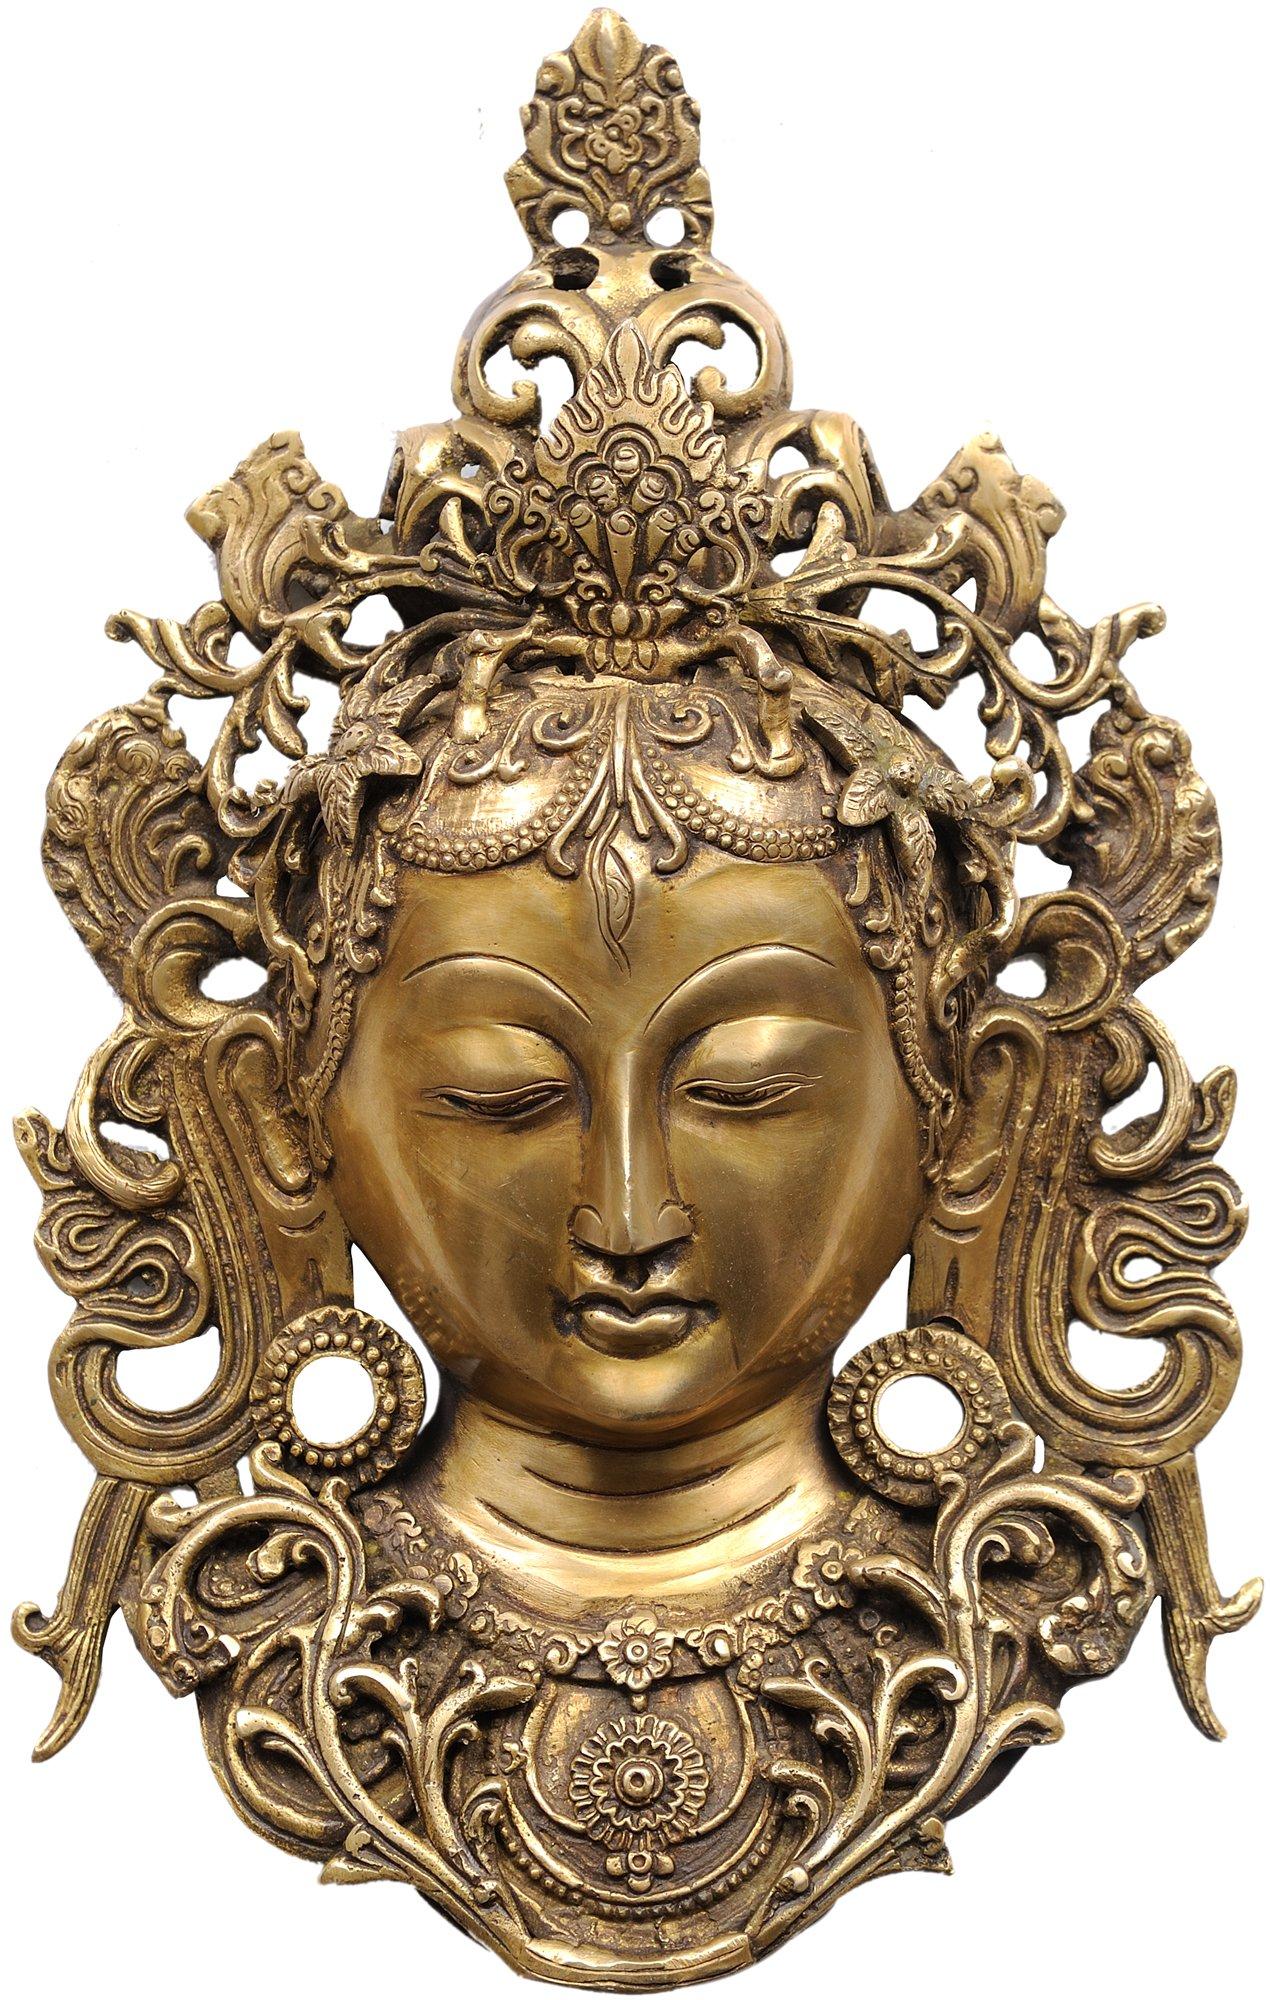 Wall Hanging Tara Mask - Brass Statue